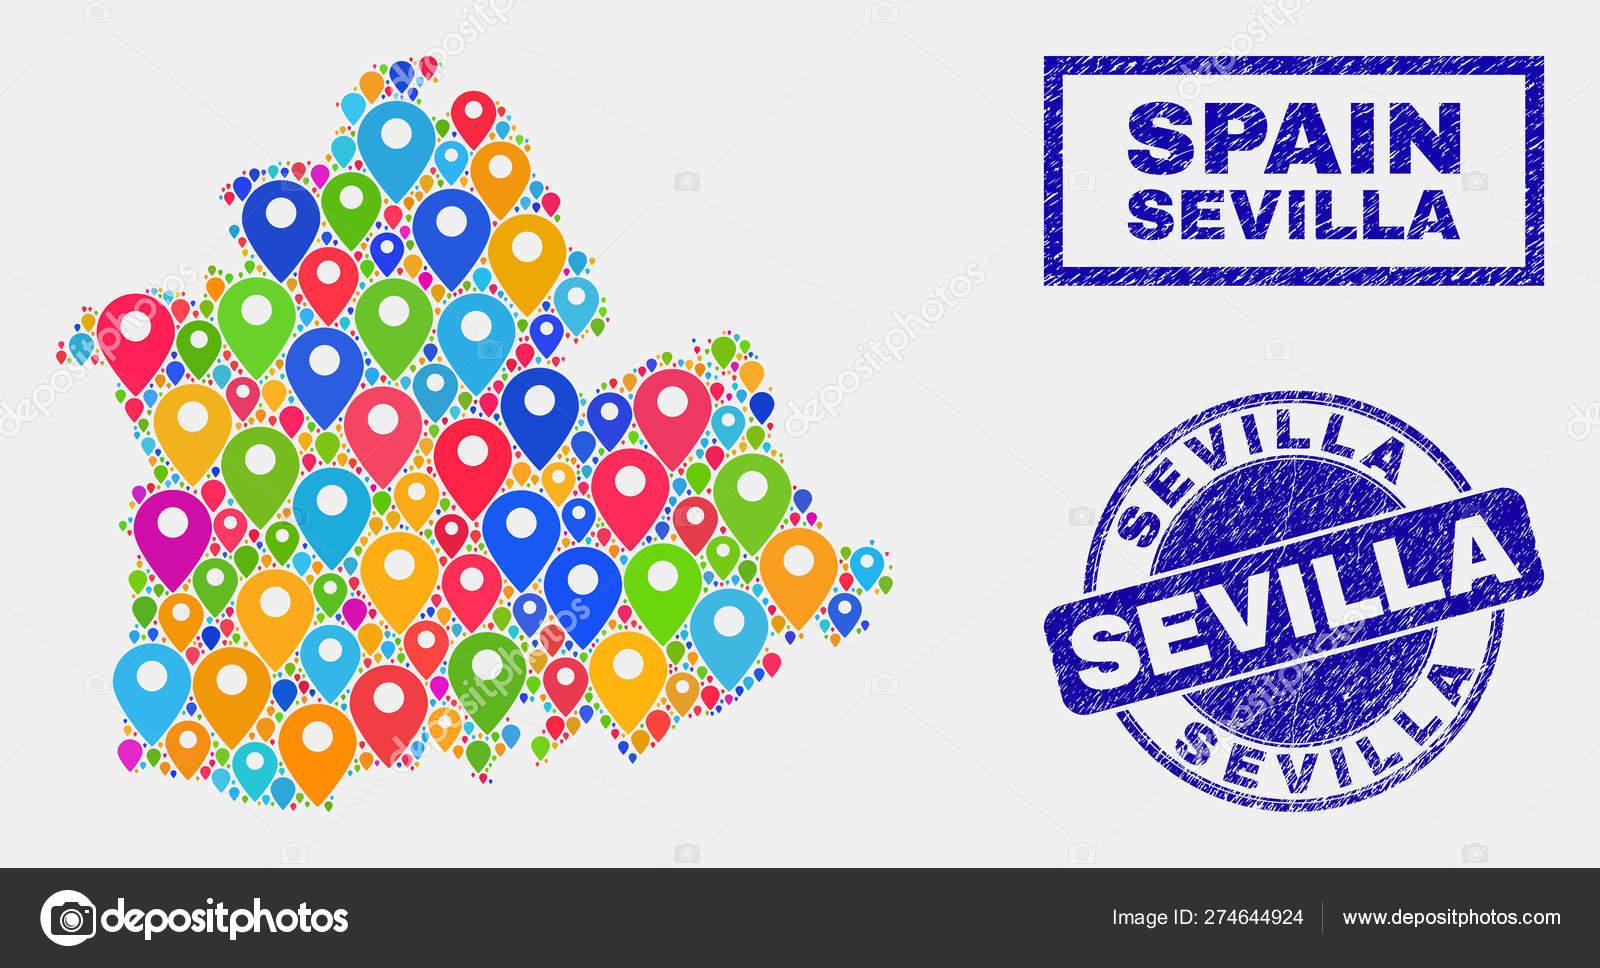 Provincia De Sevilla Mapa.Mapa Pines Mosaico De La Provincia De Sevilla Mapa Y Sellos